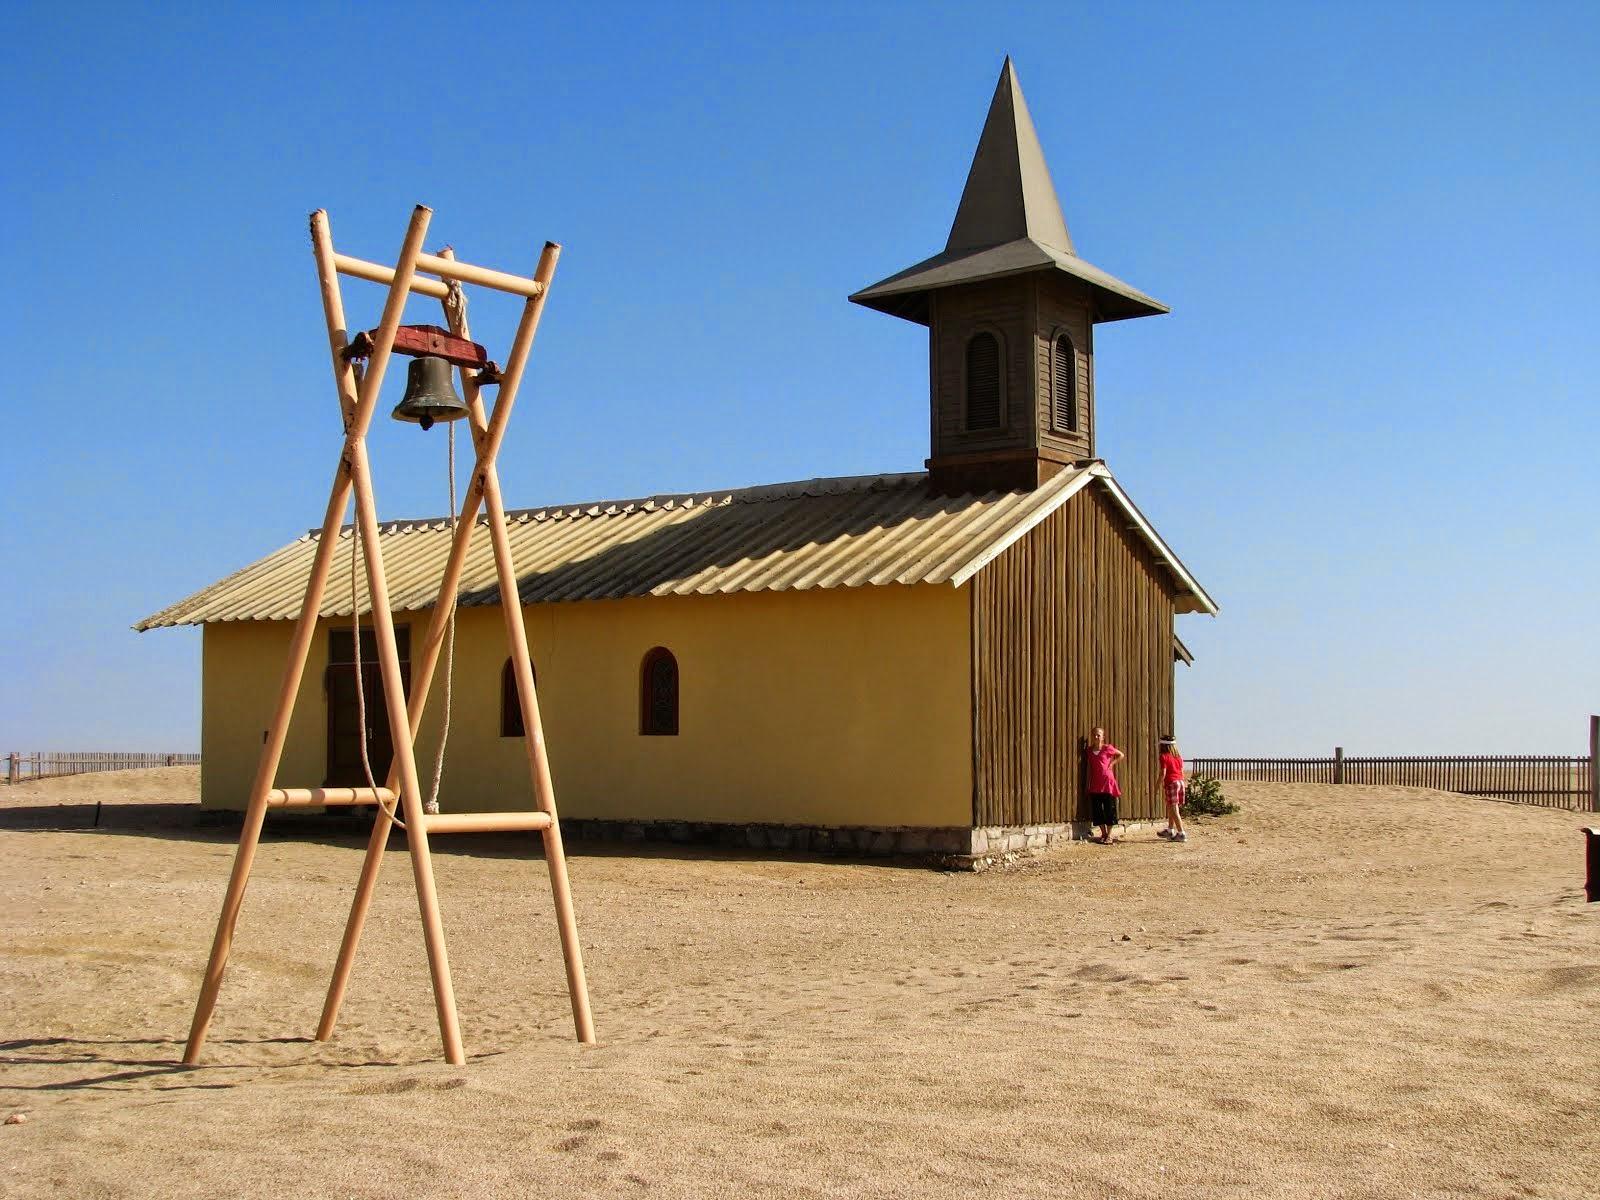 Namibia - church in the Namib